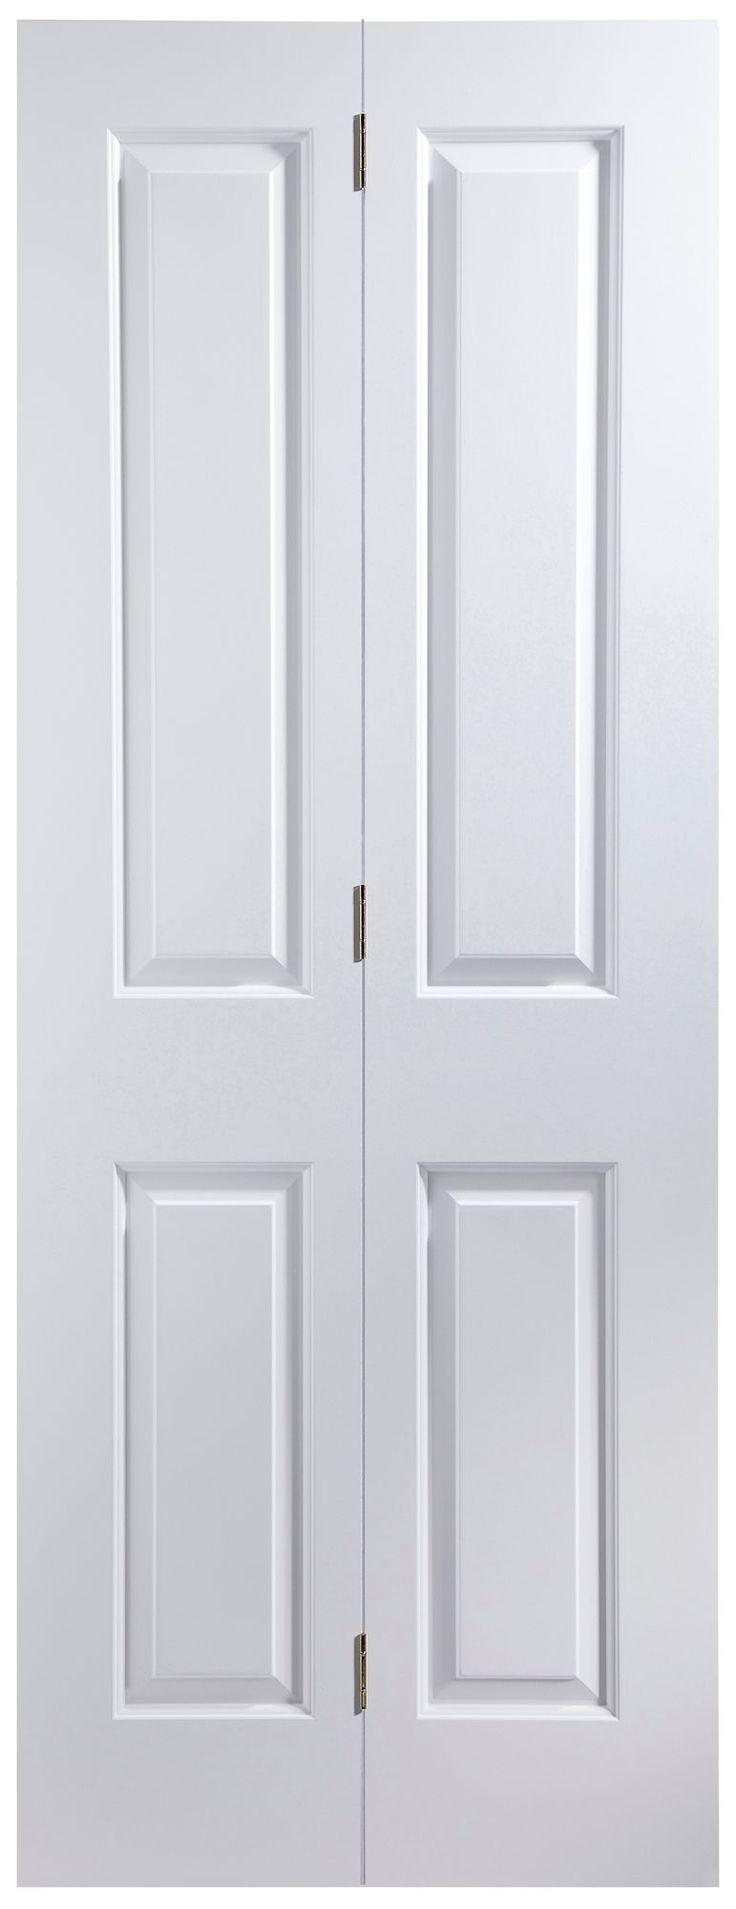 4 Panel Primed Smooth Glazed Internal Bi-Fold Door, (H)1950mm (W)750mm | Departments | DIY at B&Q